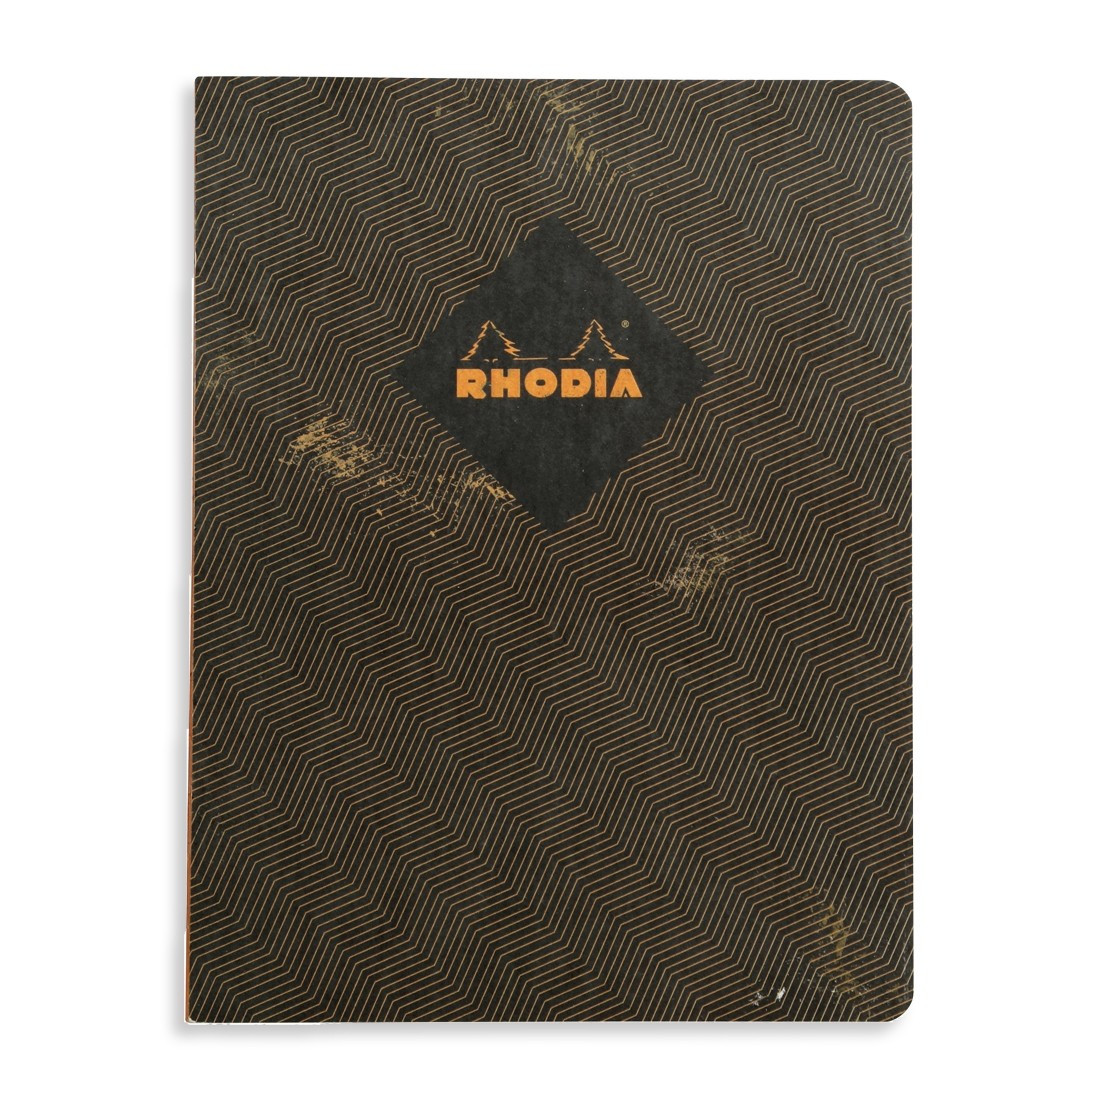 Rhodia Heritage Notebook - Black Chevrons